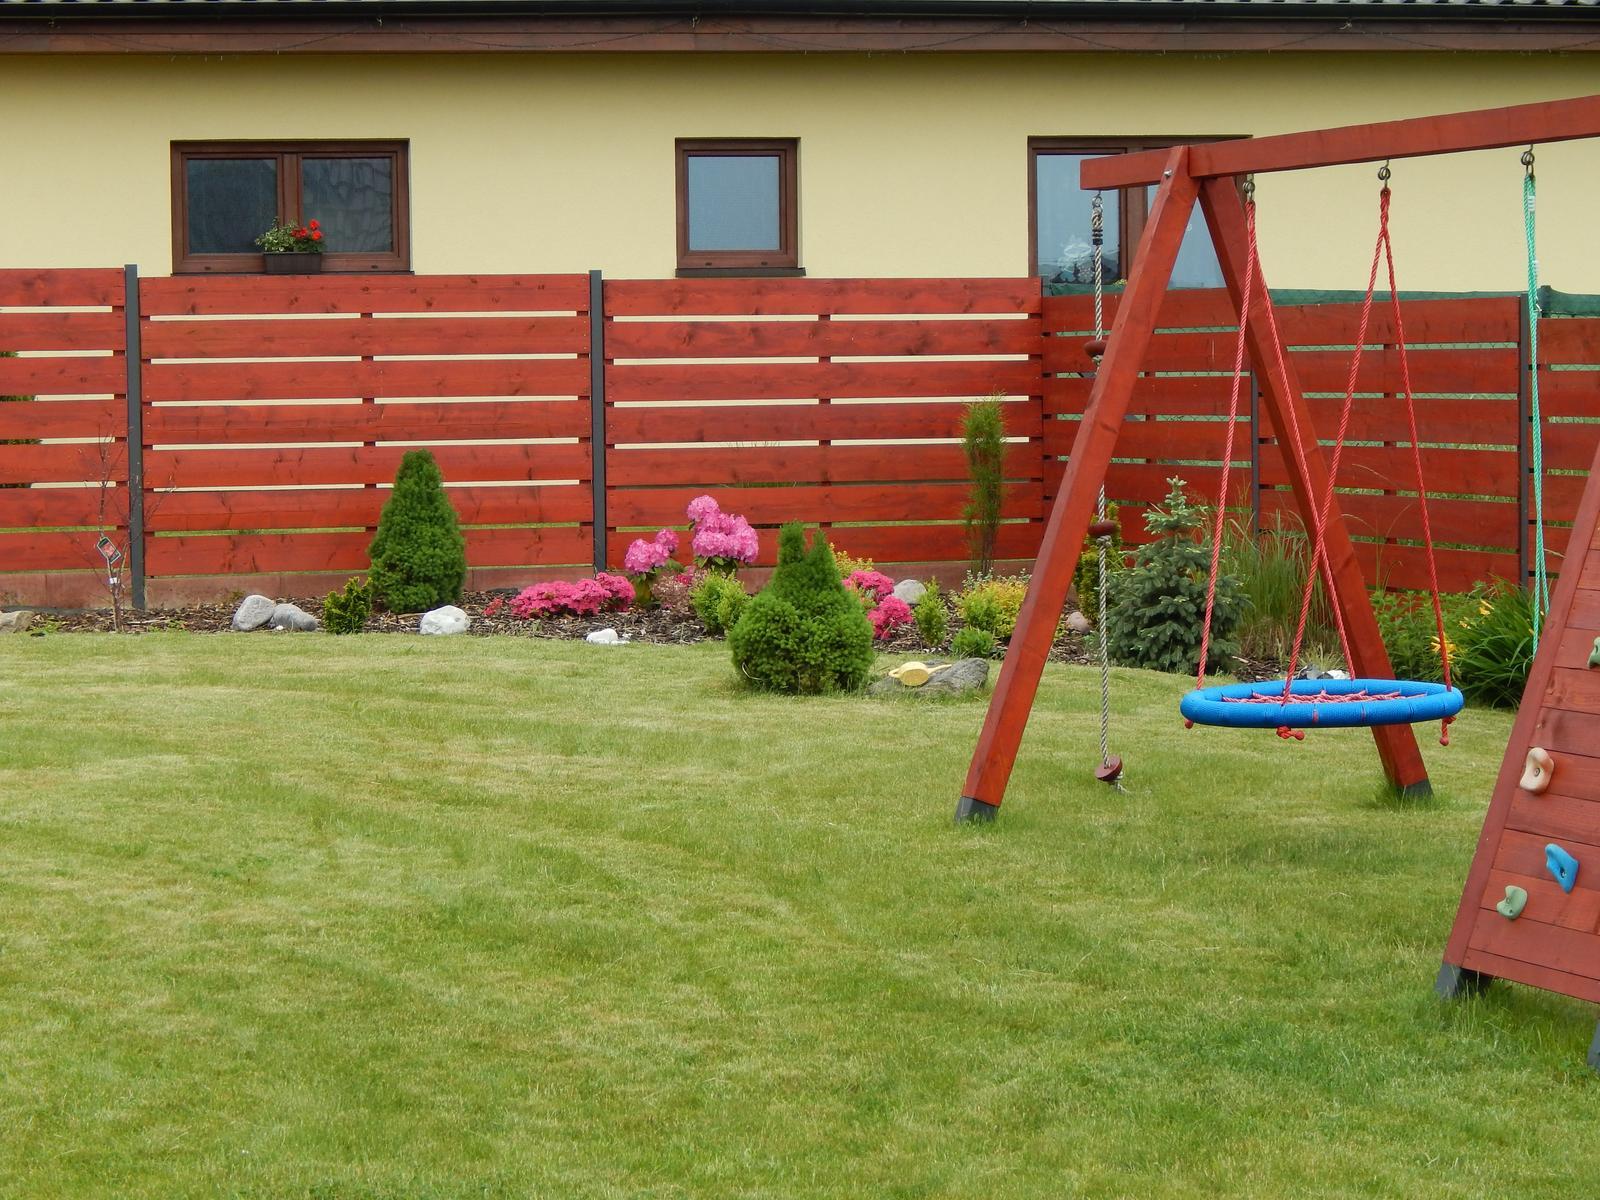 Naše zahrada - Obrázek č. 2